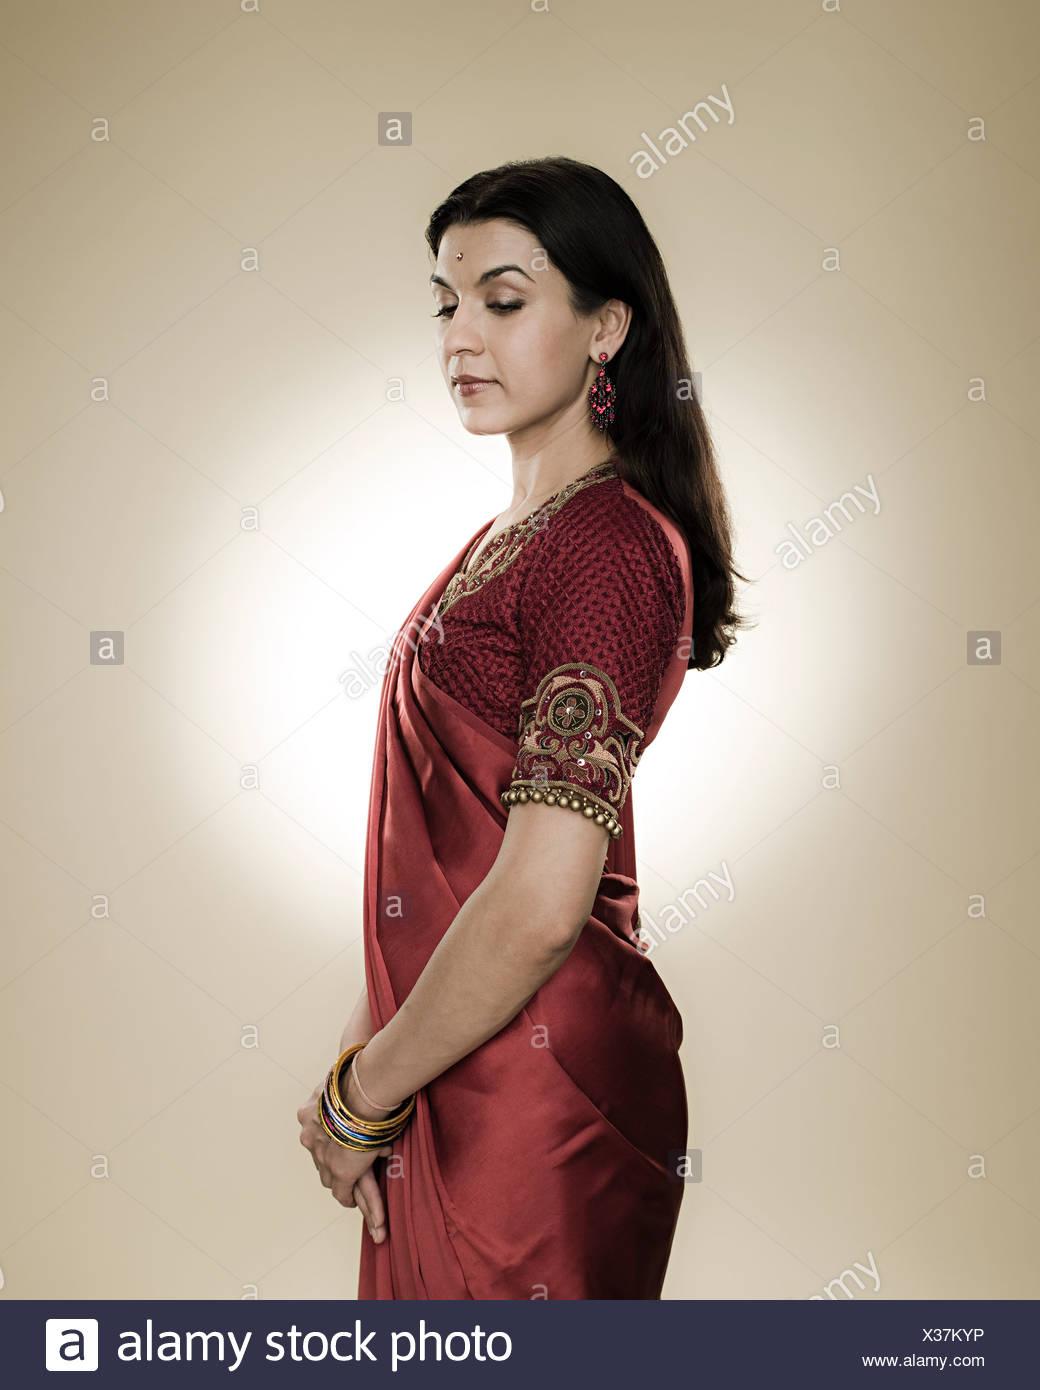 Portrait of a hindu woman - Stock Image